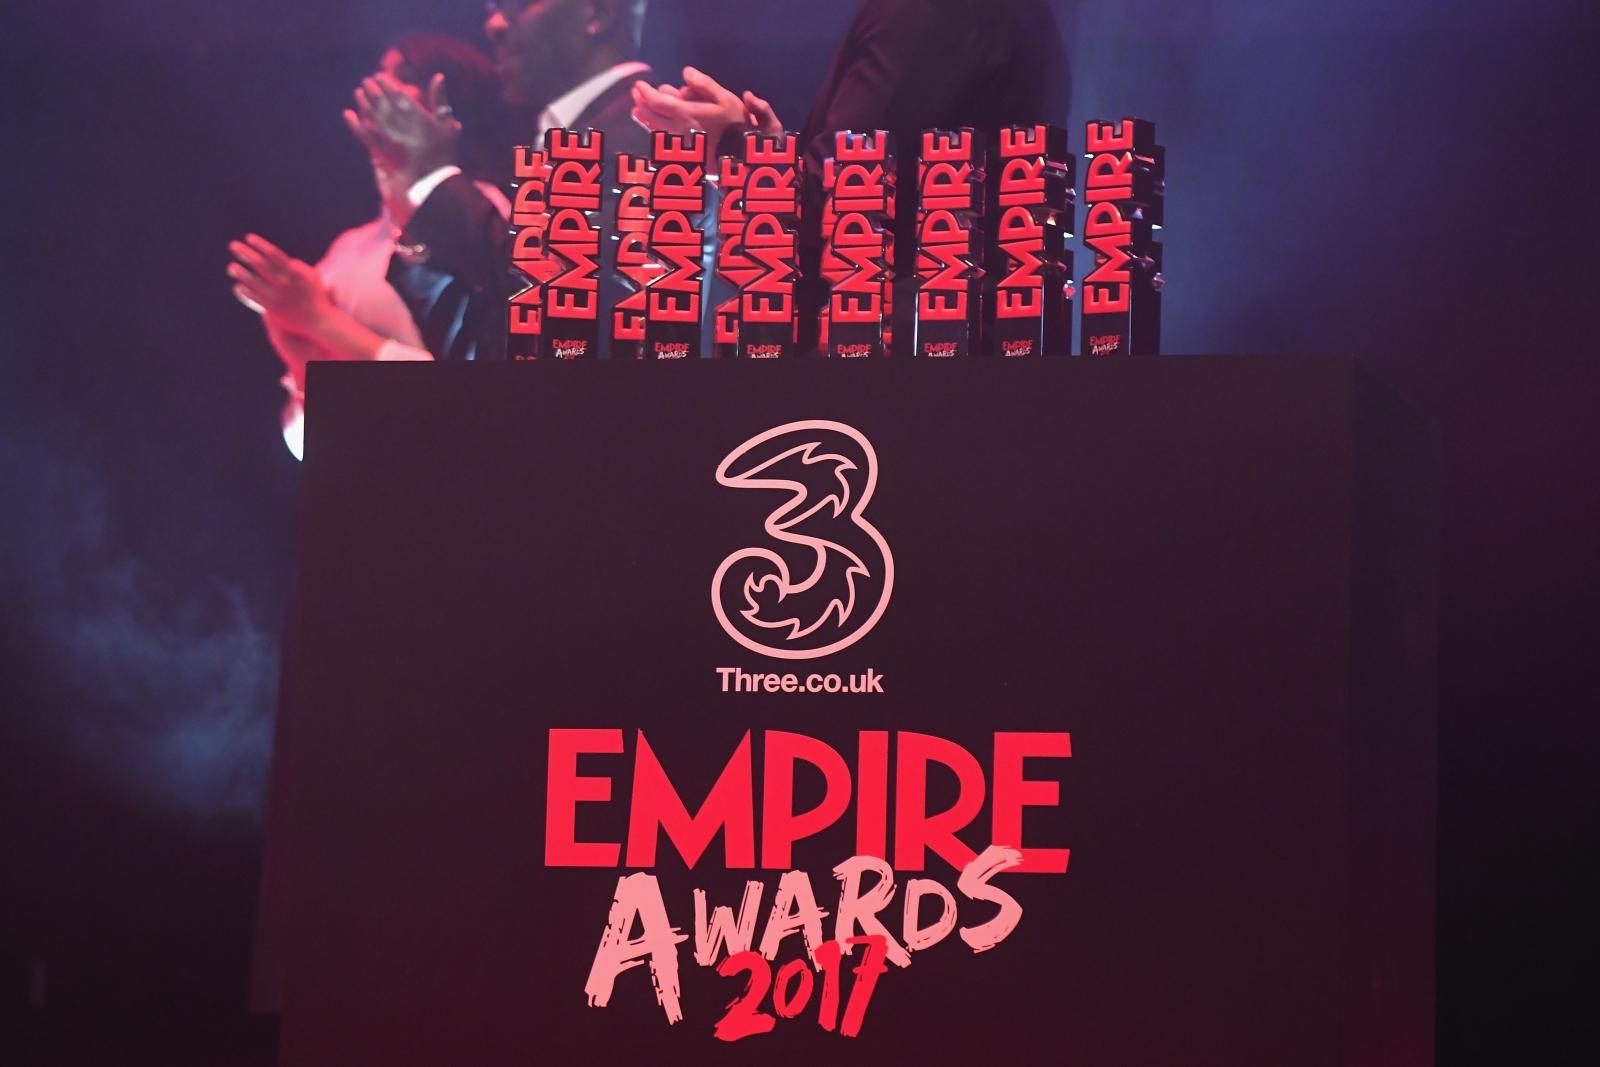 Empire Awards 2017